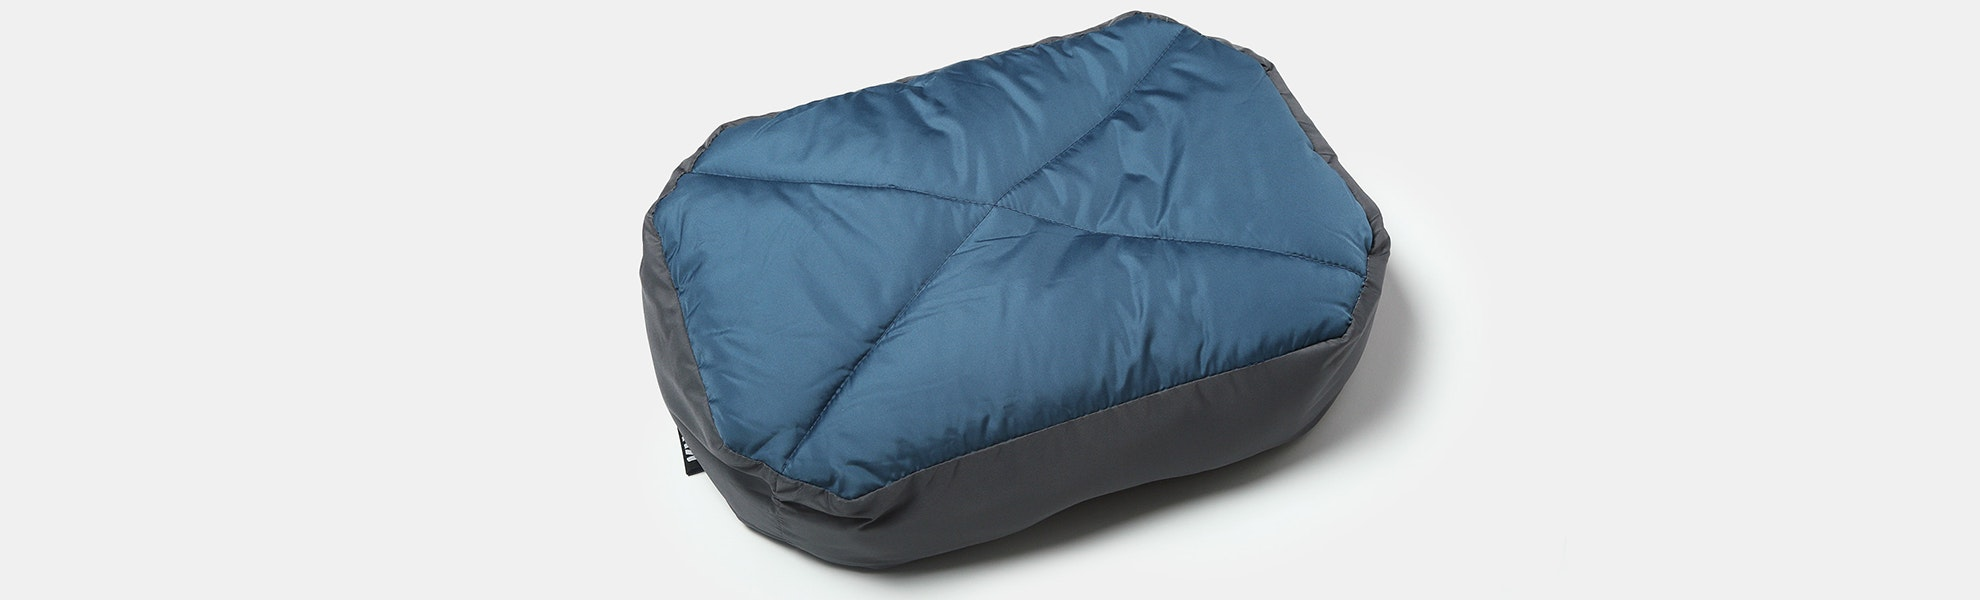 Klymit Top Down Pillow